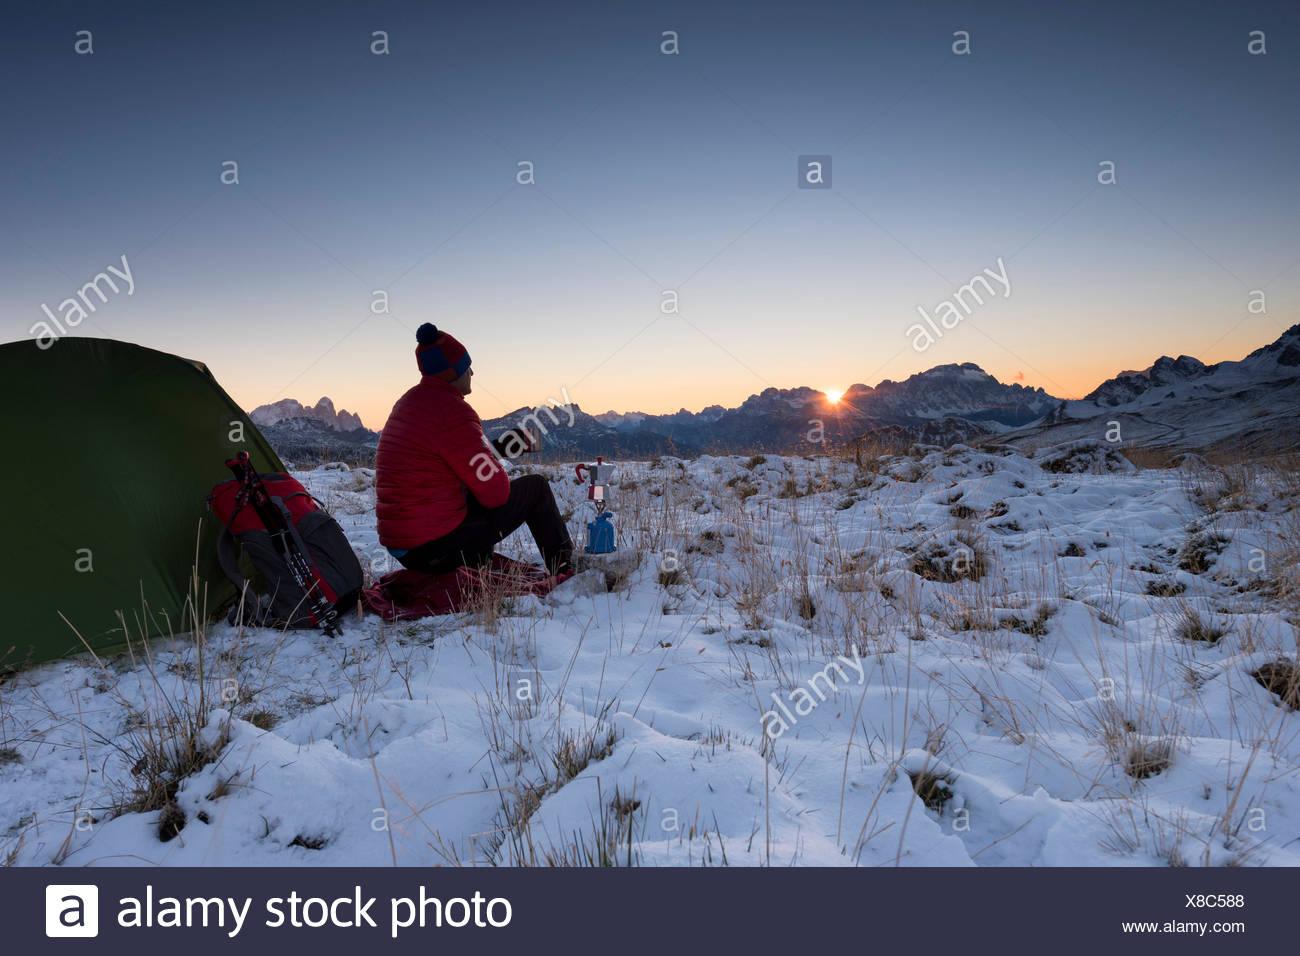 Dolomites, Fassa Valley, San Pellegrino Pass, Europe, Trentino, Alps, Italy, Stock Photo